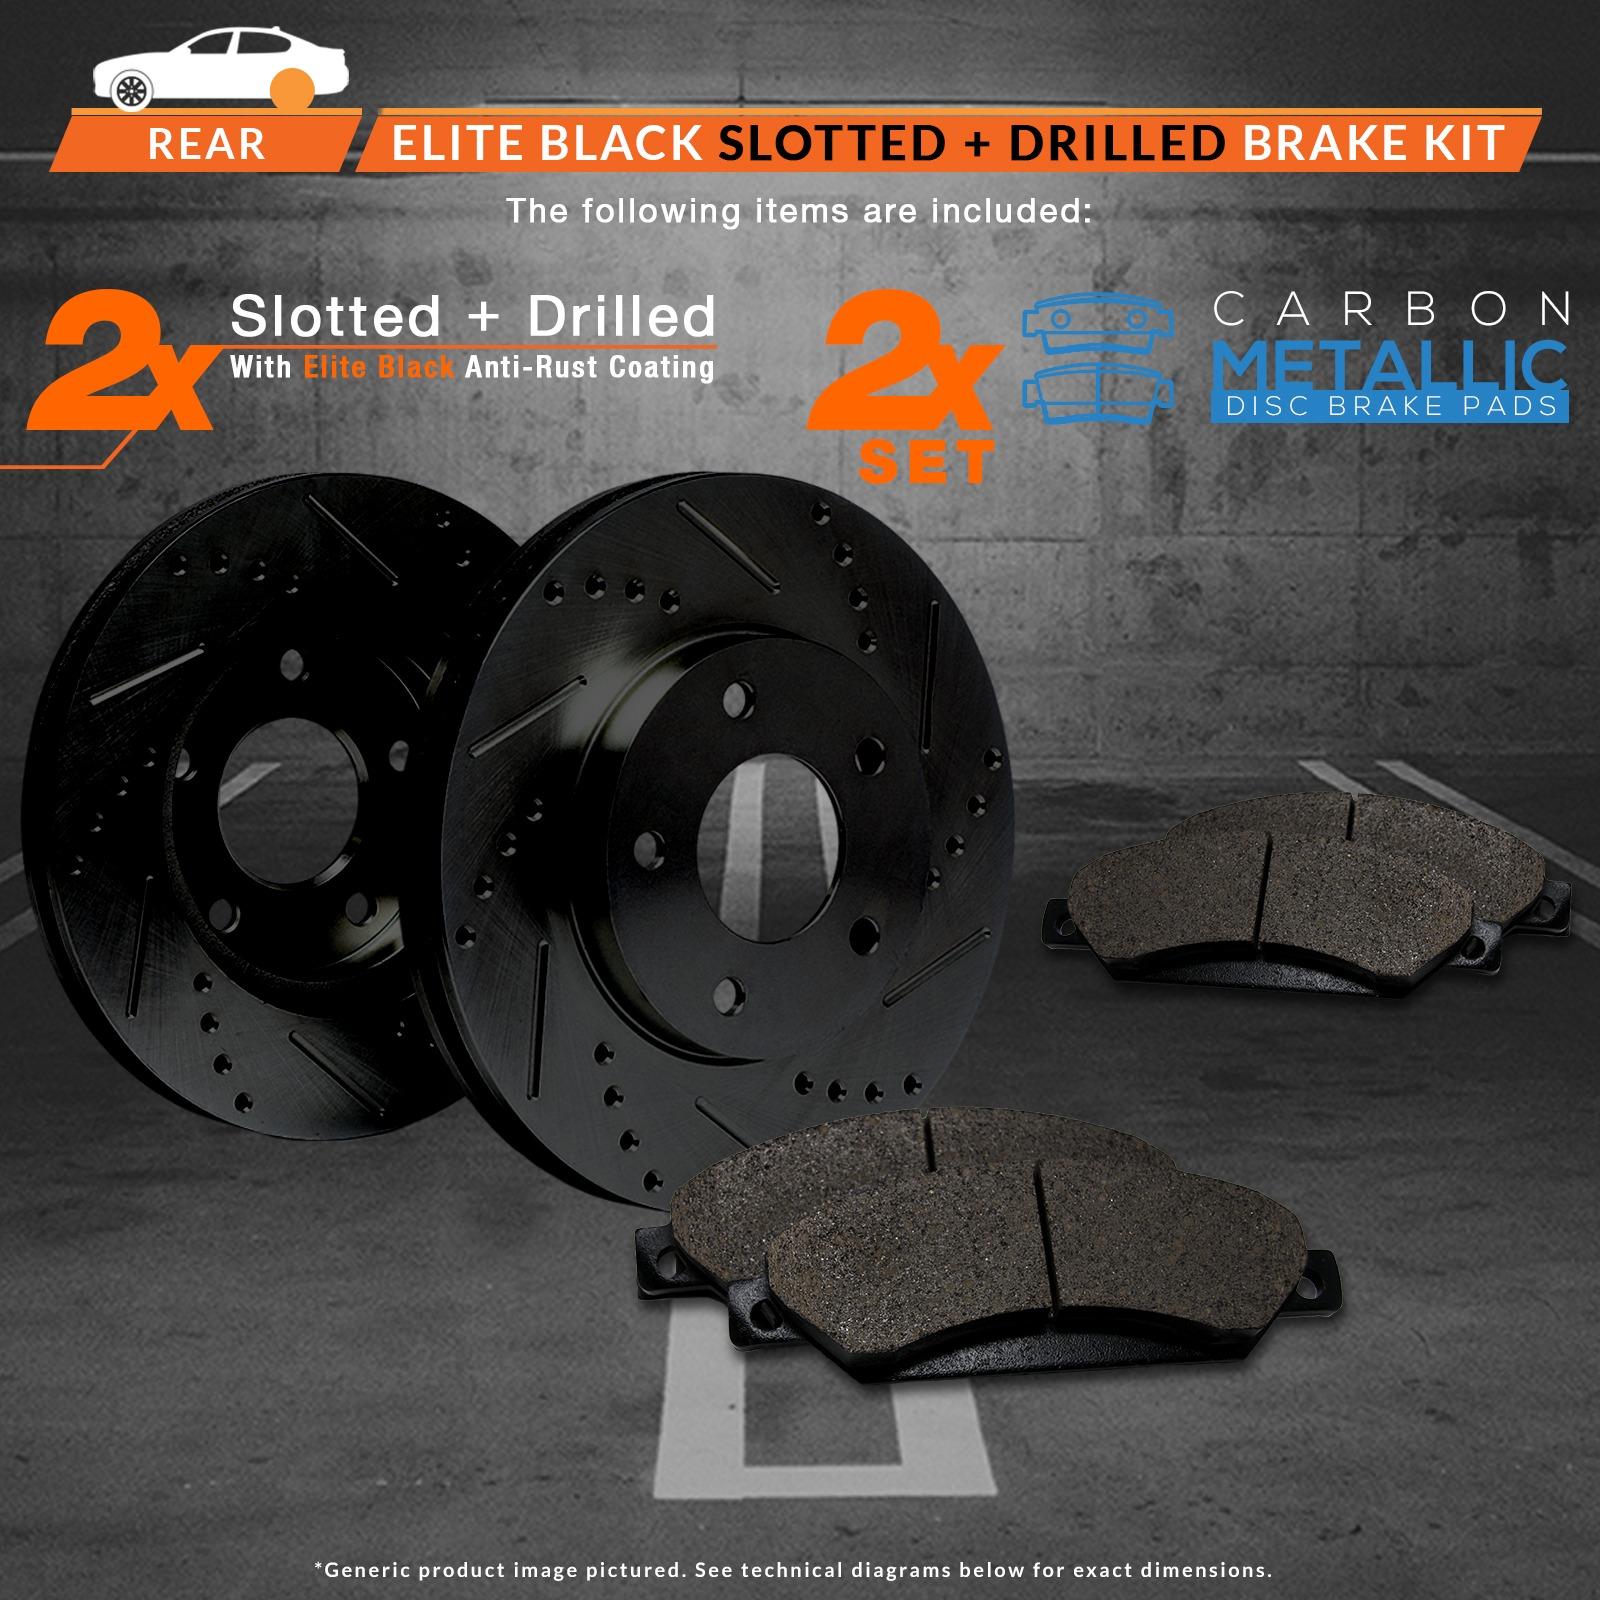 2009-2010-Pontiac-Vibe-2-4L-Base-Black-Slot-Drill-Rotors-Metallic-Pads-R miniature 2